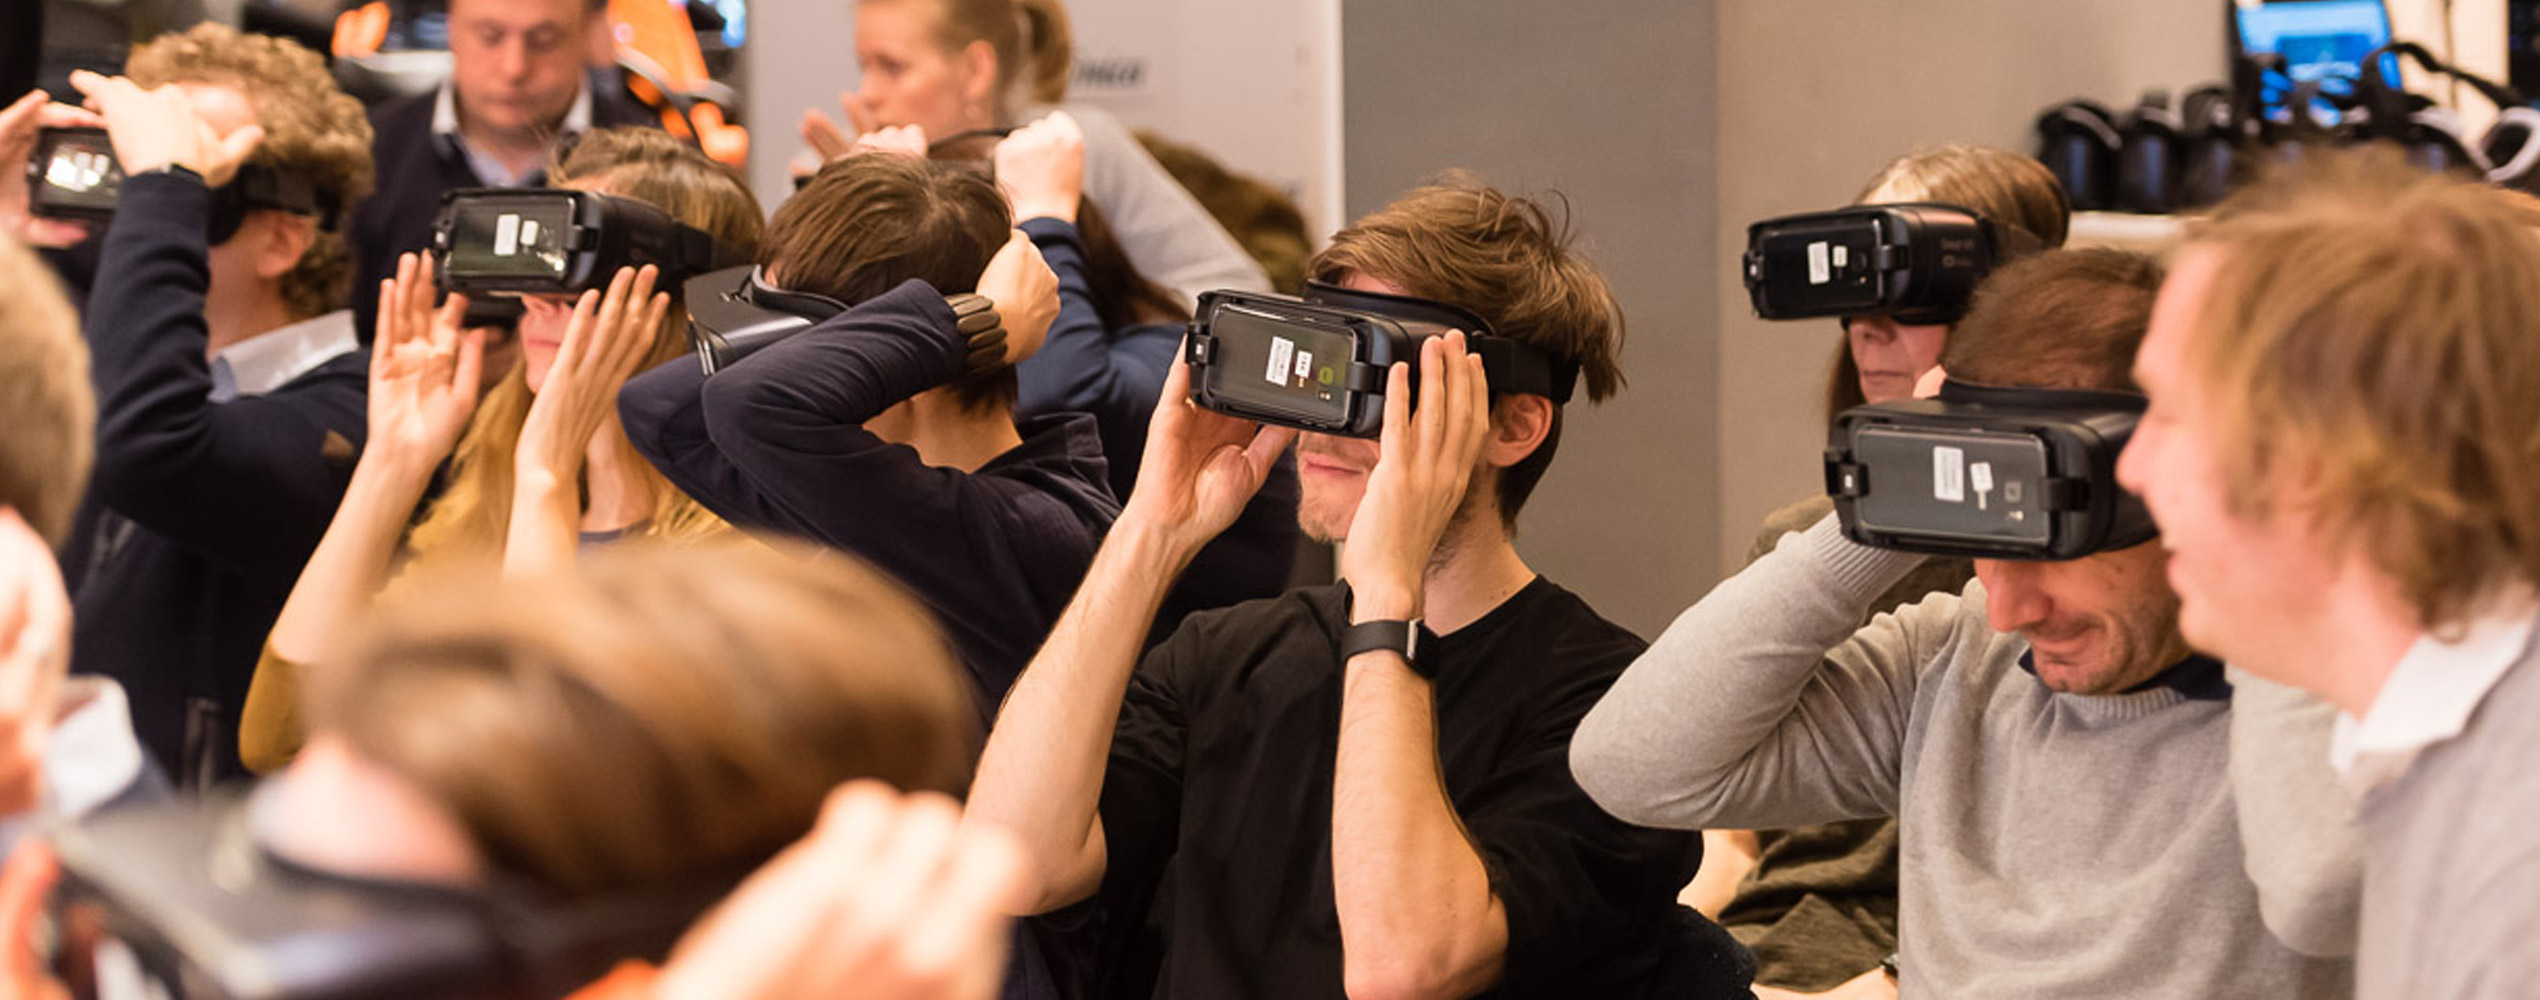 Virtual Reality - Mann mit VR-Brille BVDW Telefónica Basecamp